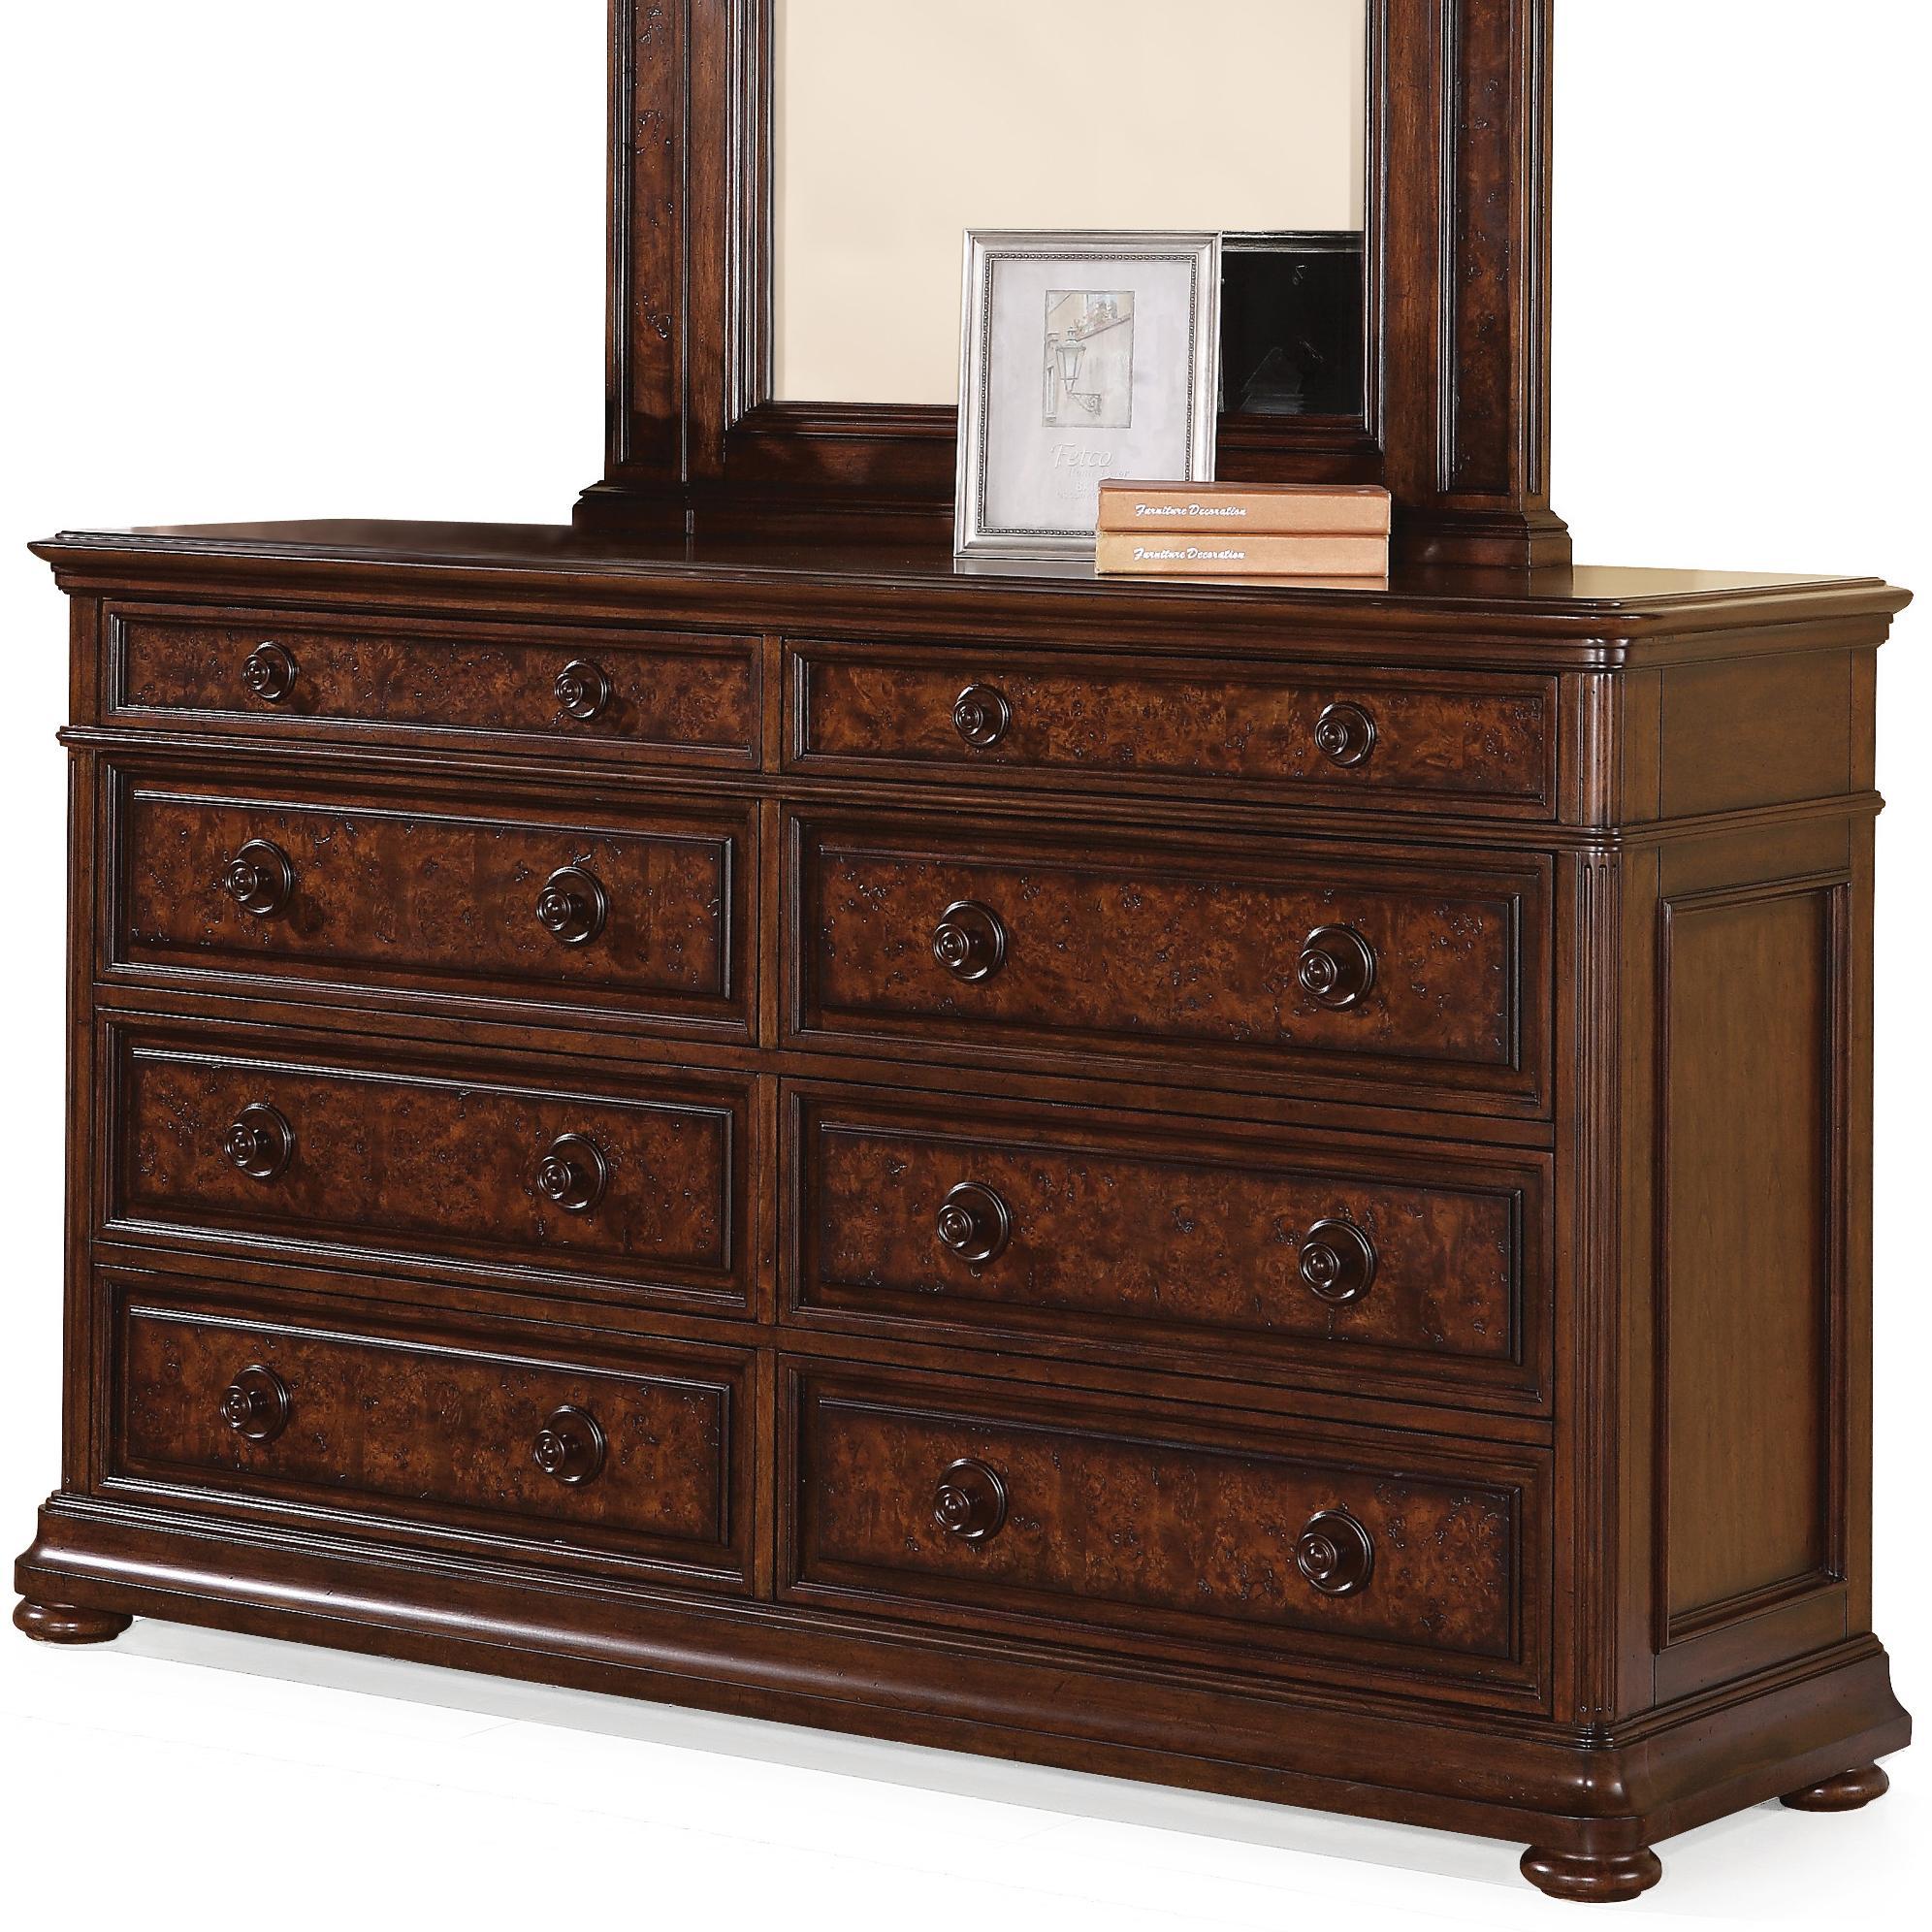 Flexsteel Wynwood Collection Aberdeen Dresser - Item Number: 1952-60